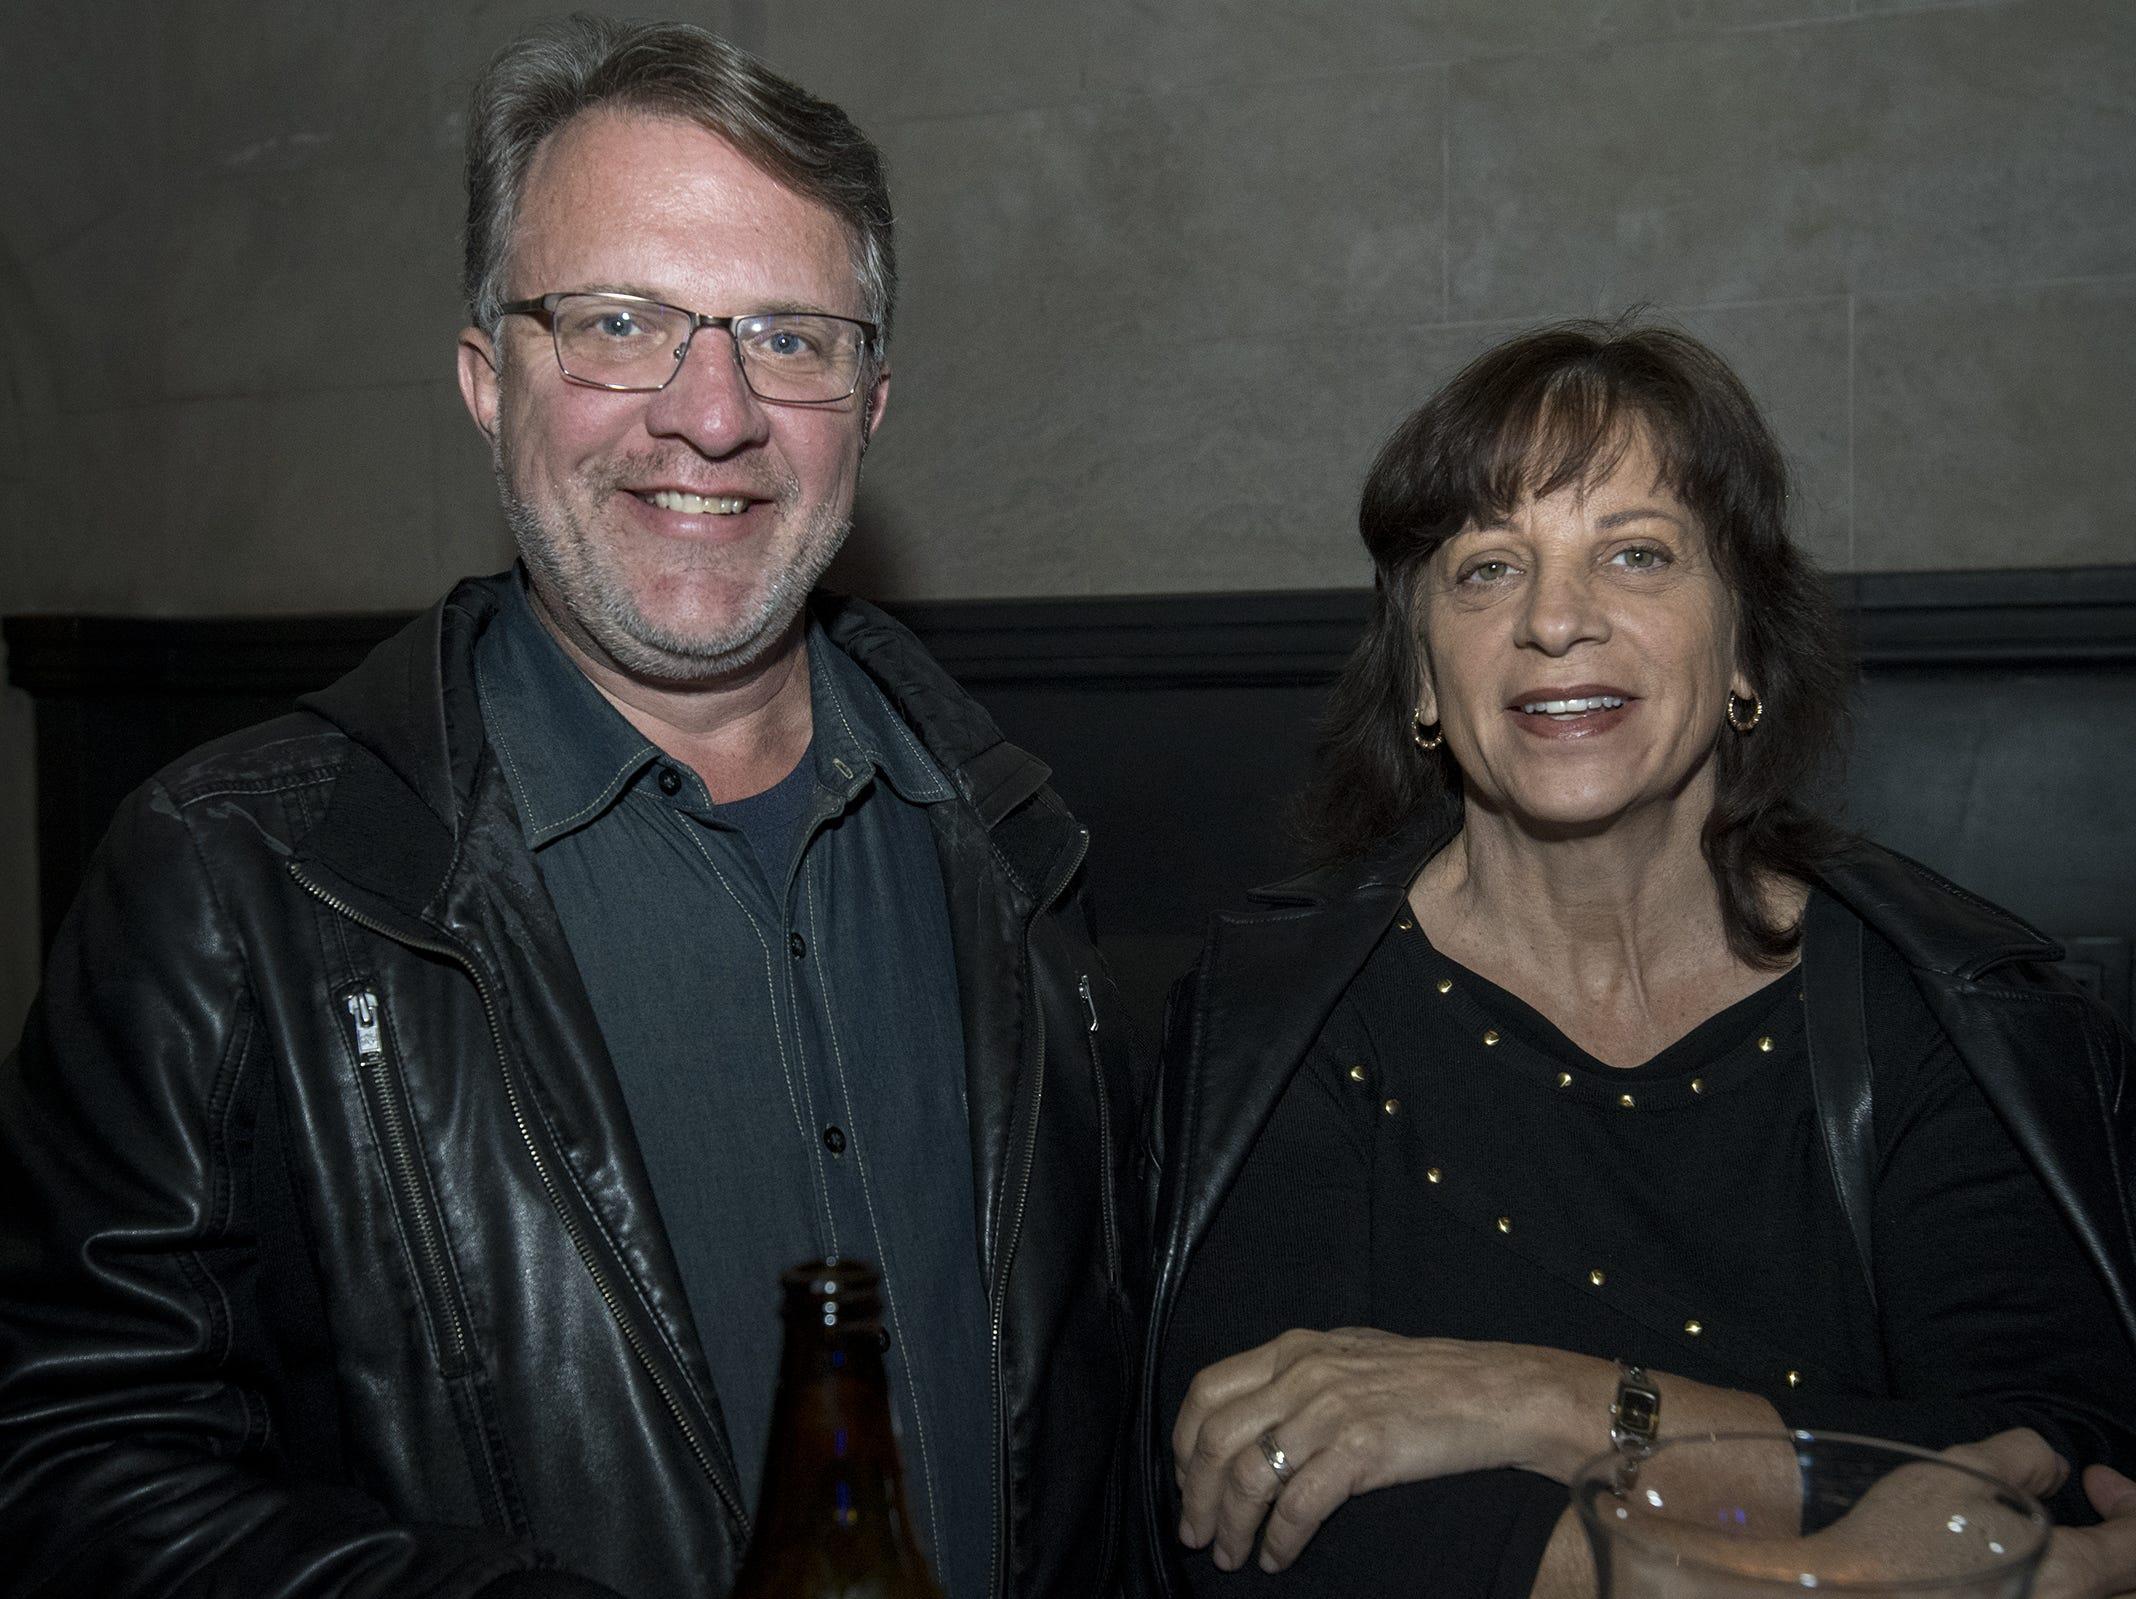 Cutoff and Margo of Tampa Bay attend Art After Dark at the Cincinnati Art Museum Wednesday, November 21, 2018 in Cincinnati, Ohio.